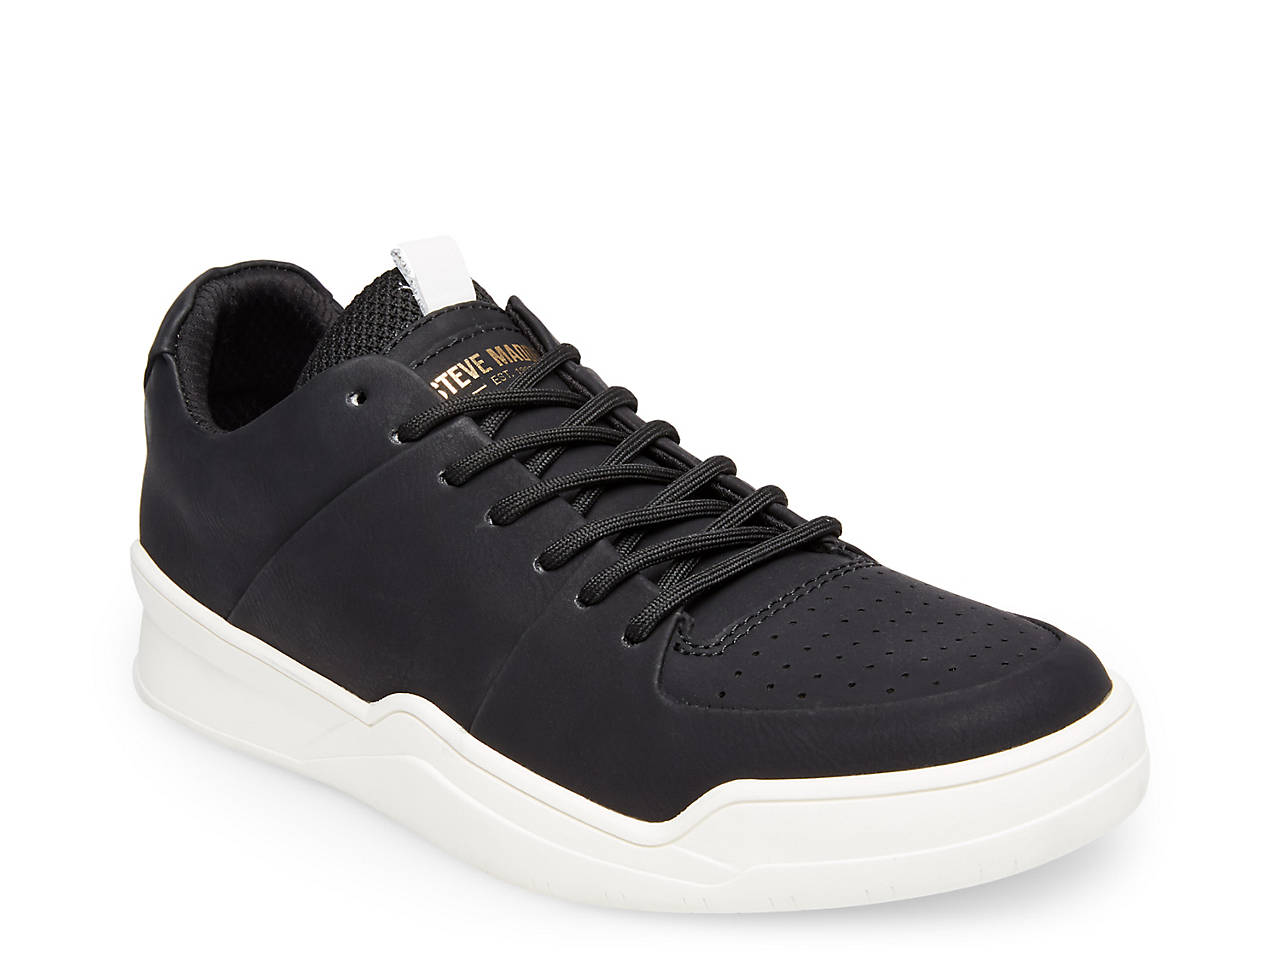 a538b64ae48 Vantage Sneaker